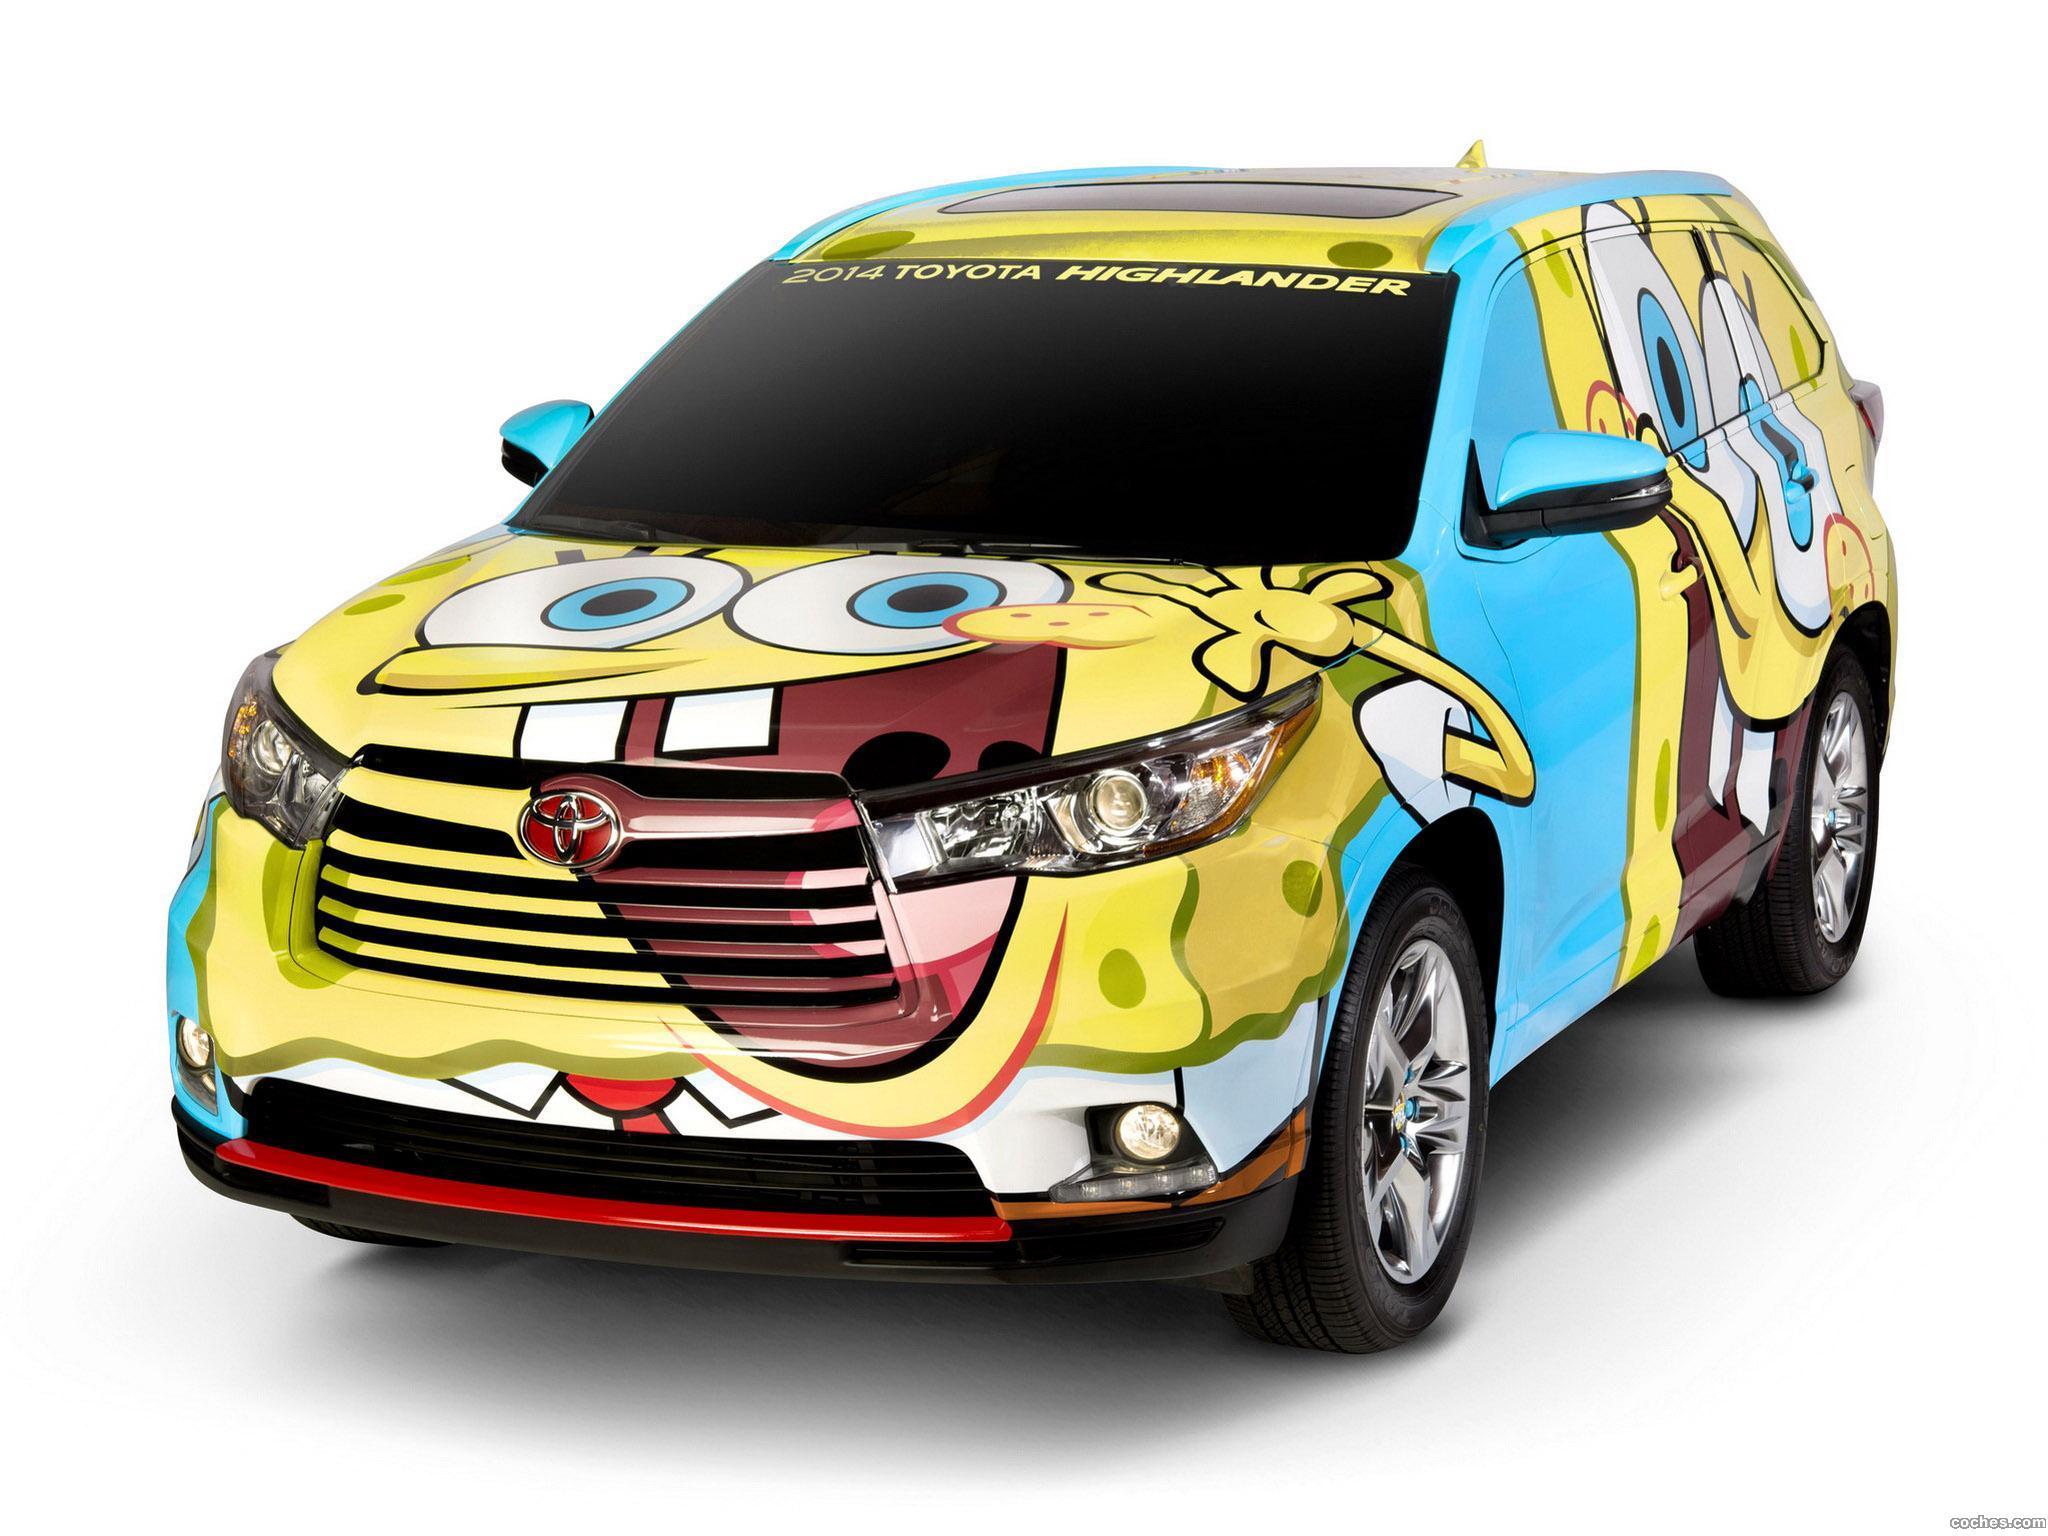 Foto 0 de Toyota Highlander Spongebob Squarepants Concept 2013